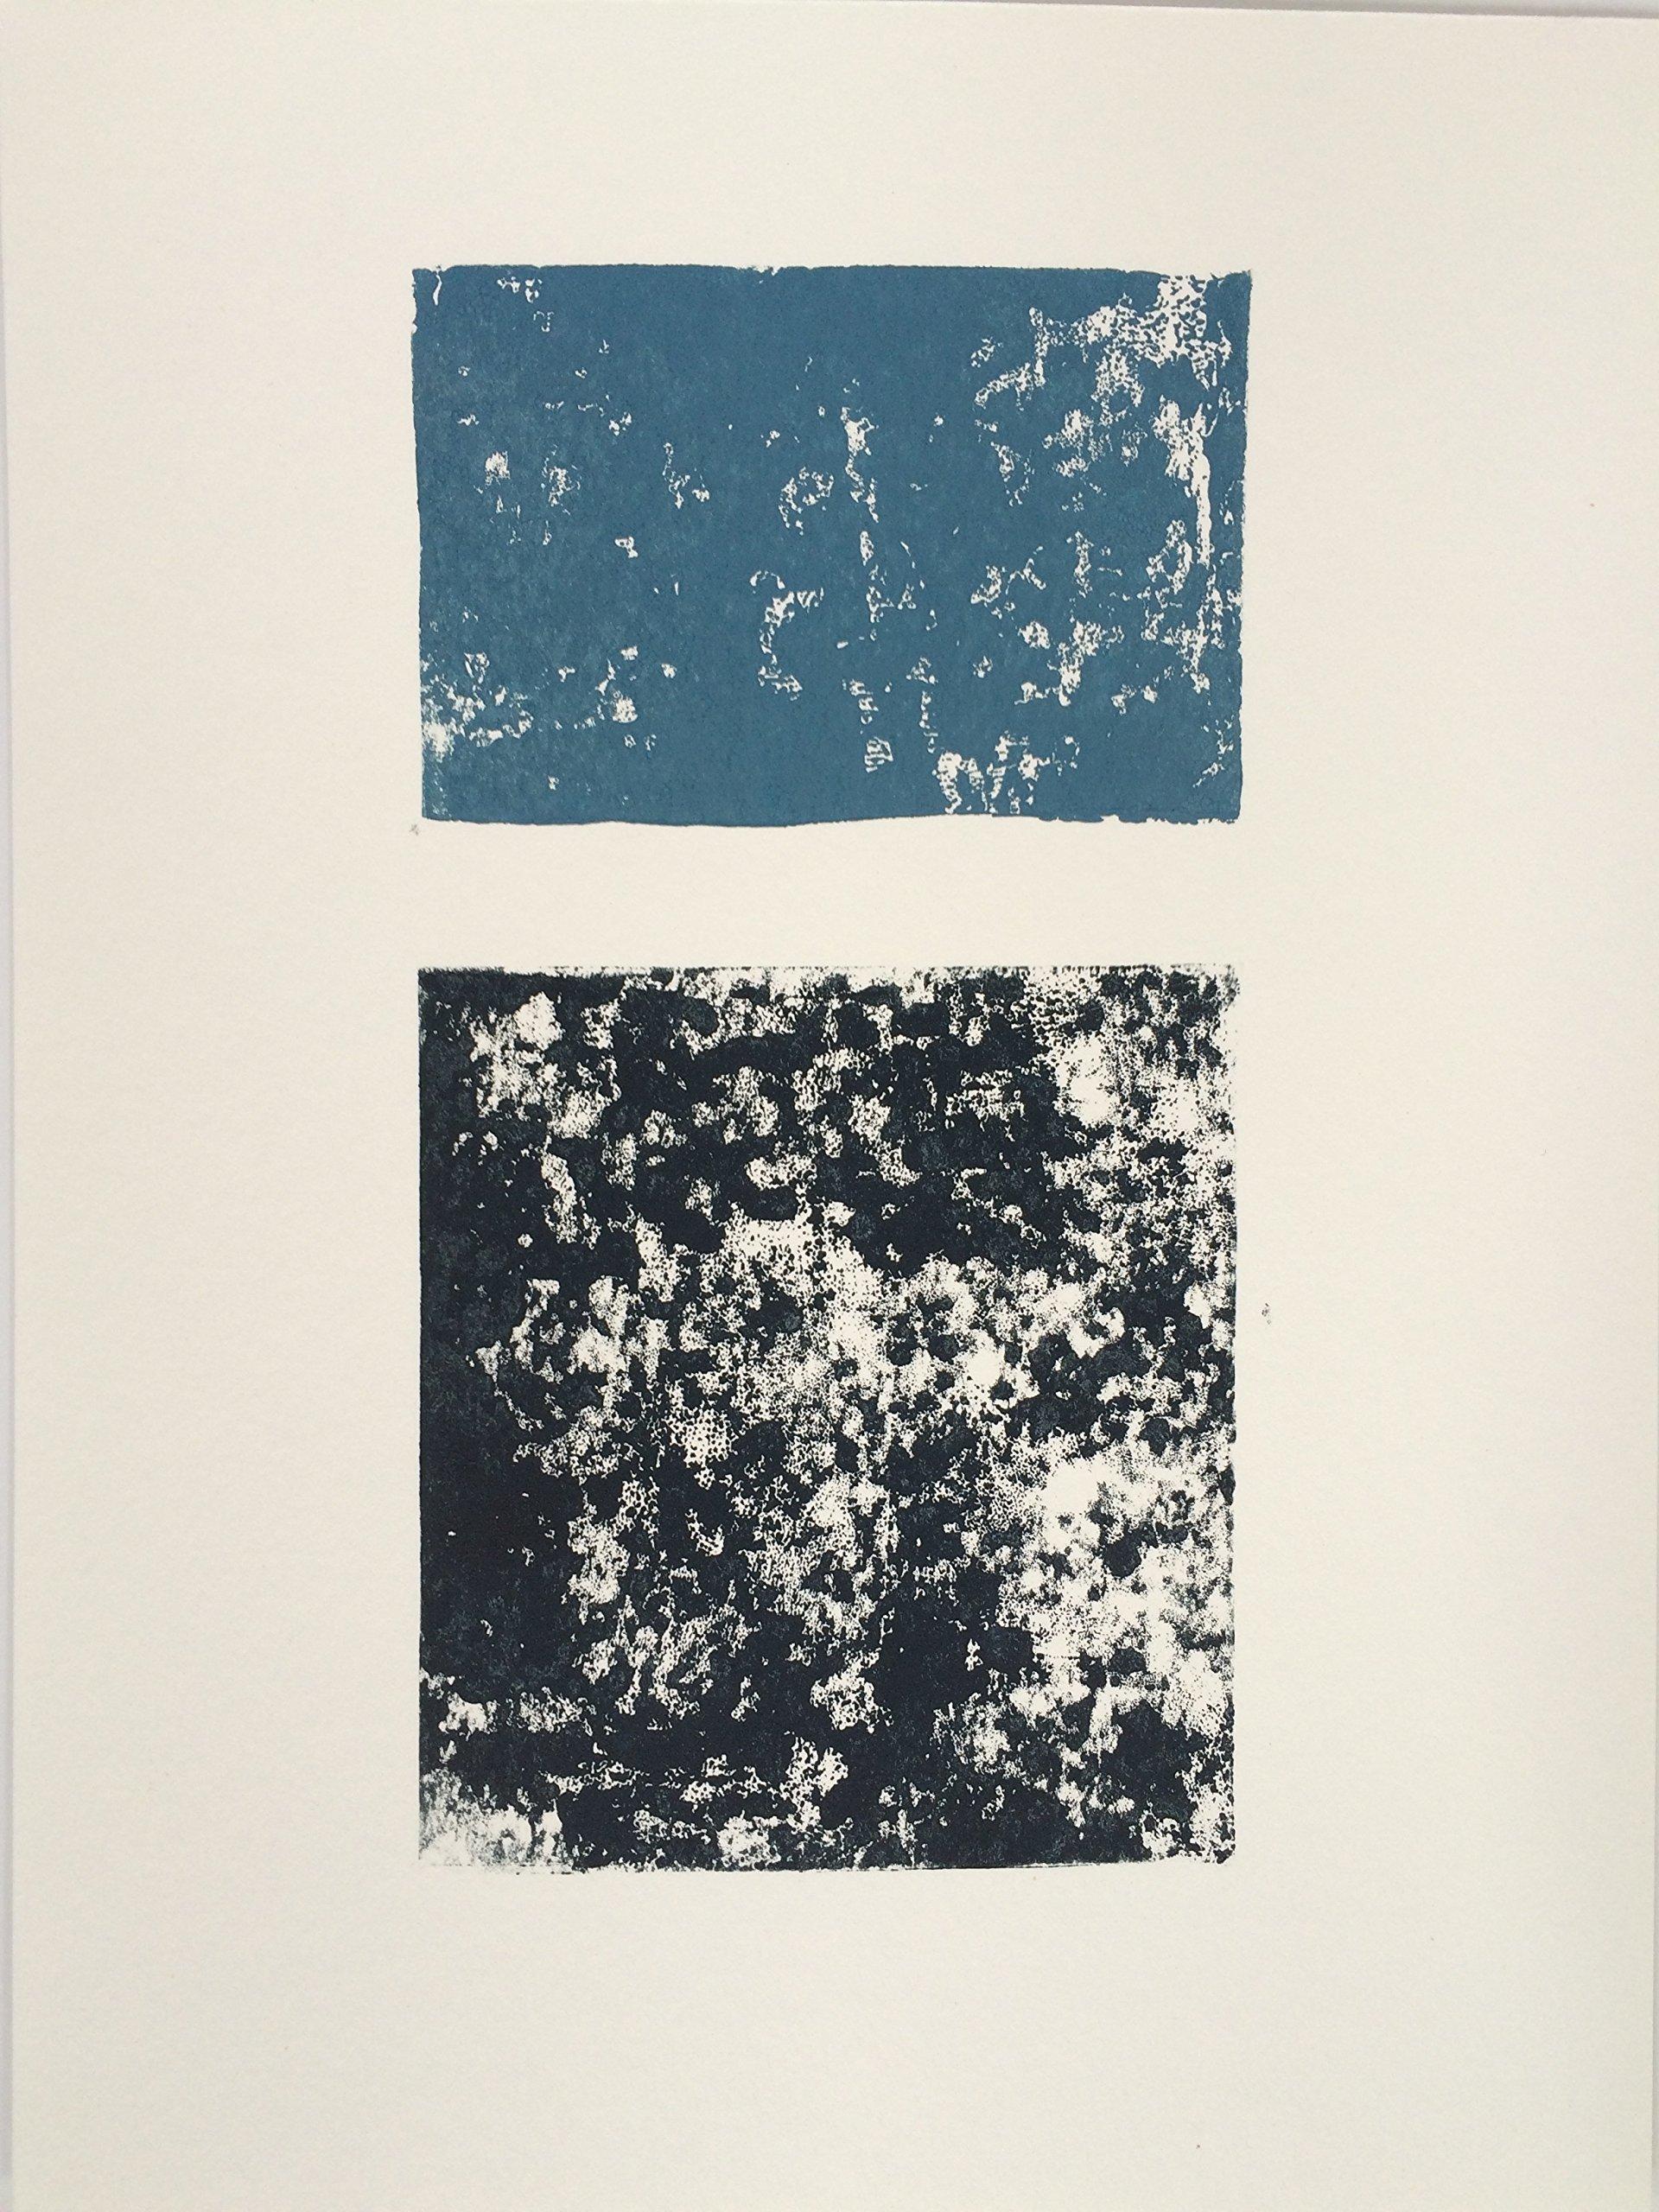 Midnight Blue and Black striking 9x12 block print by